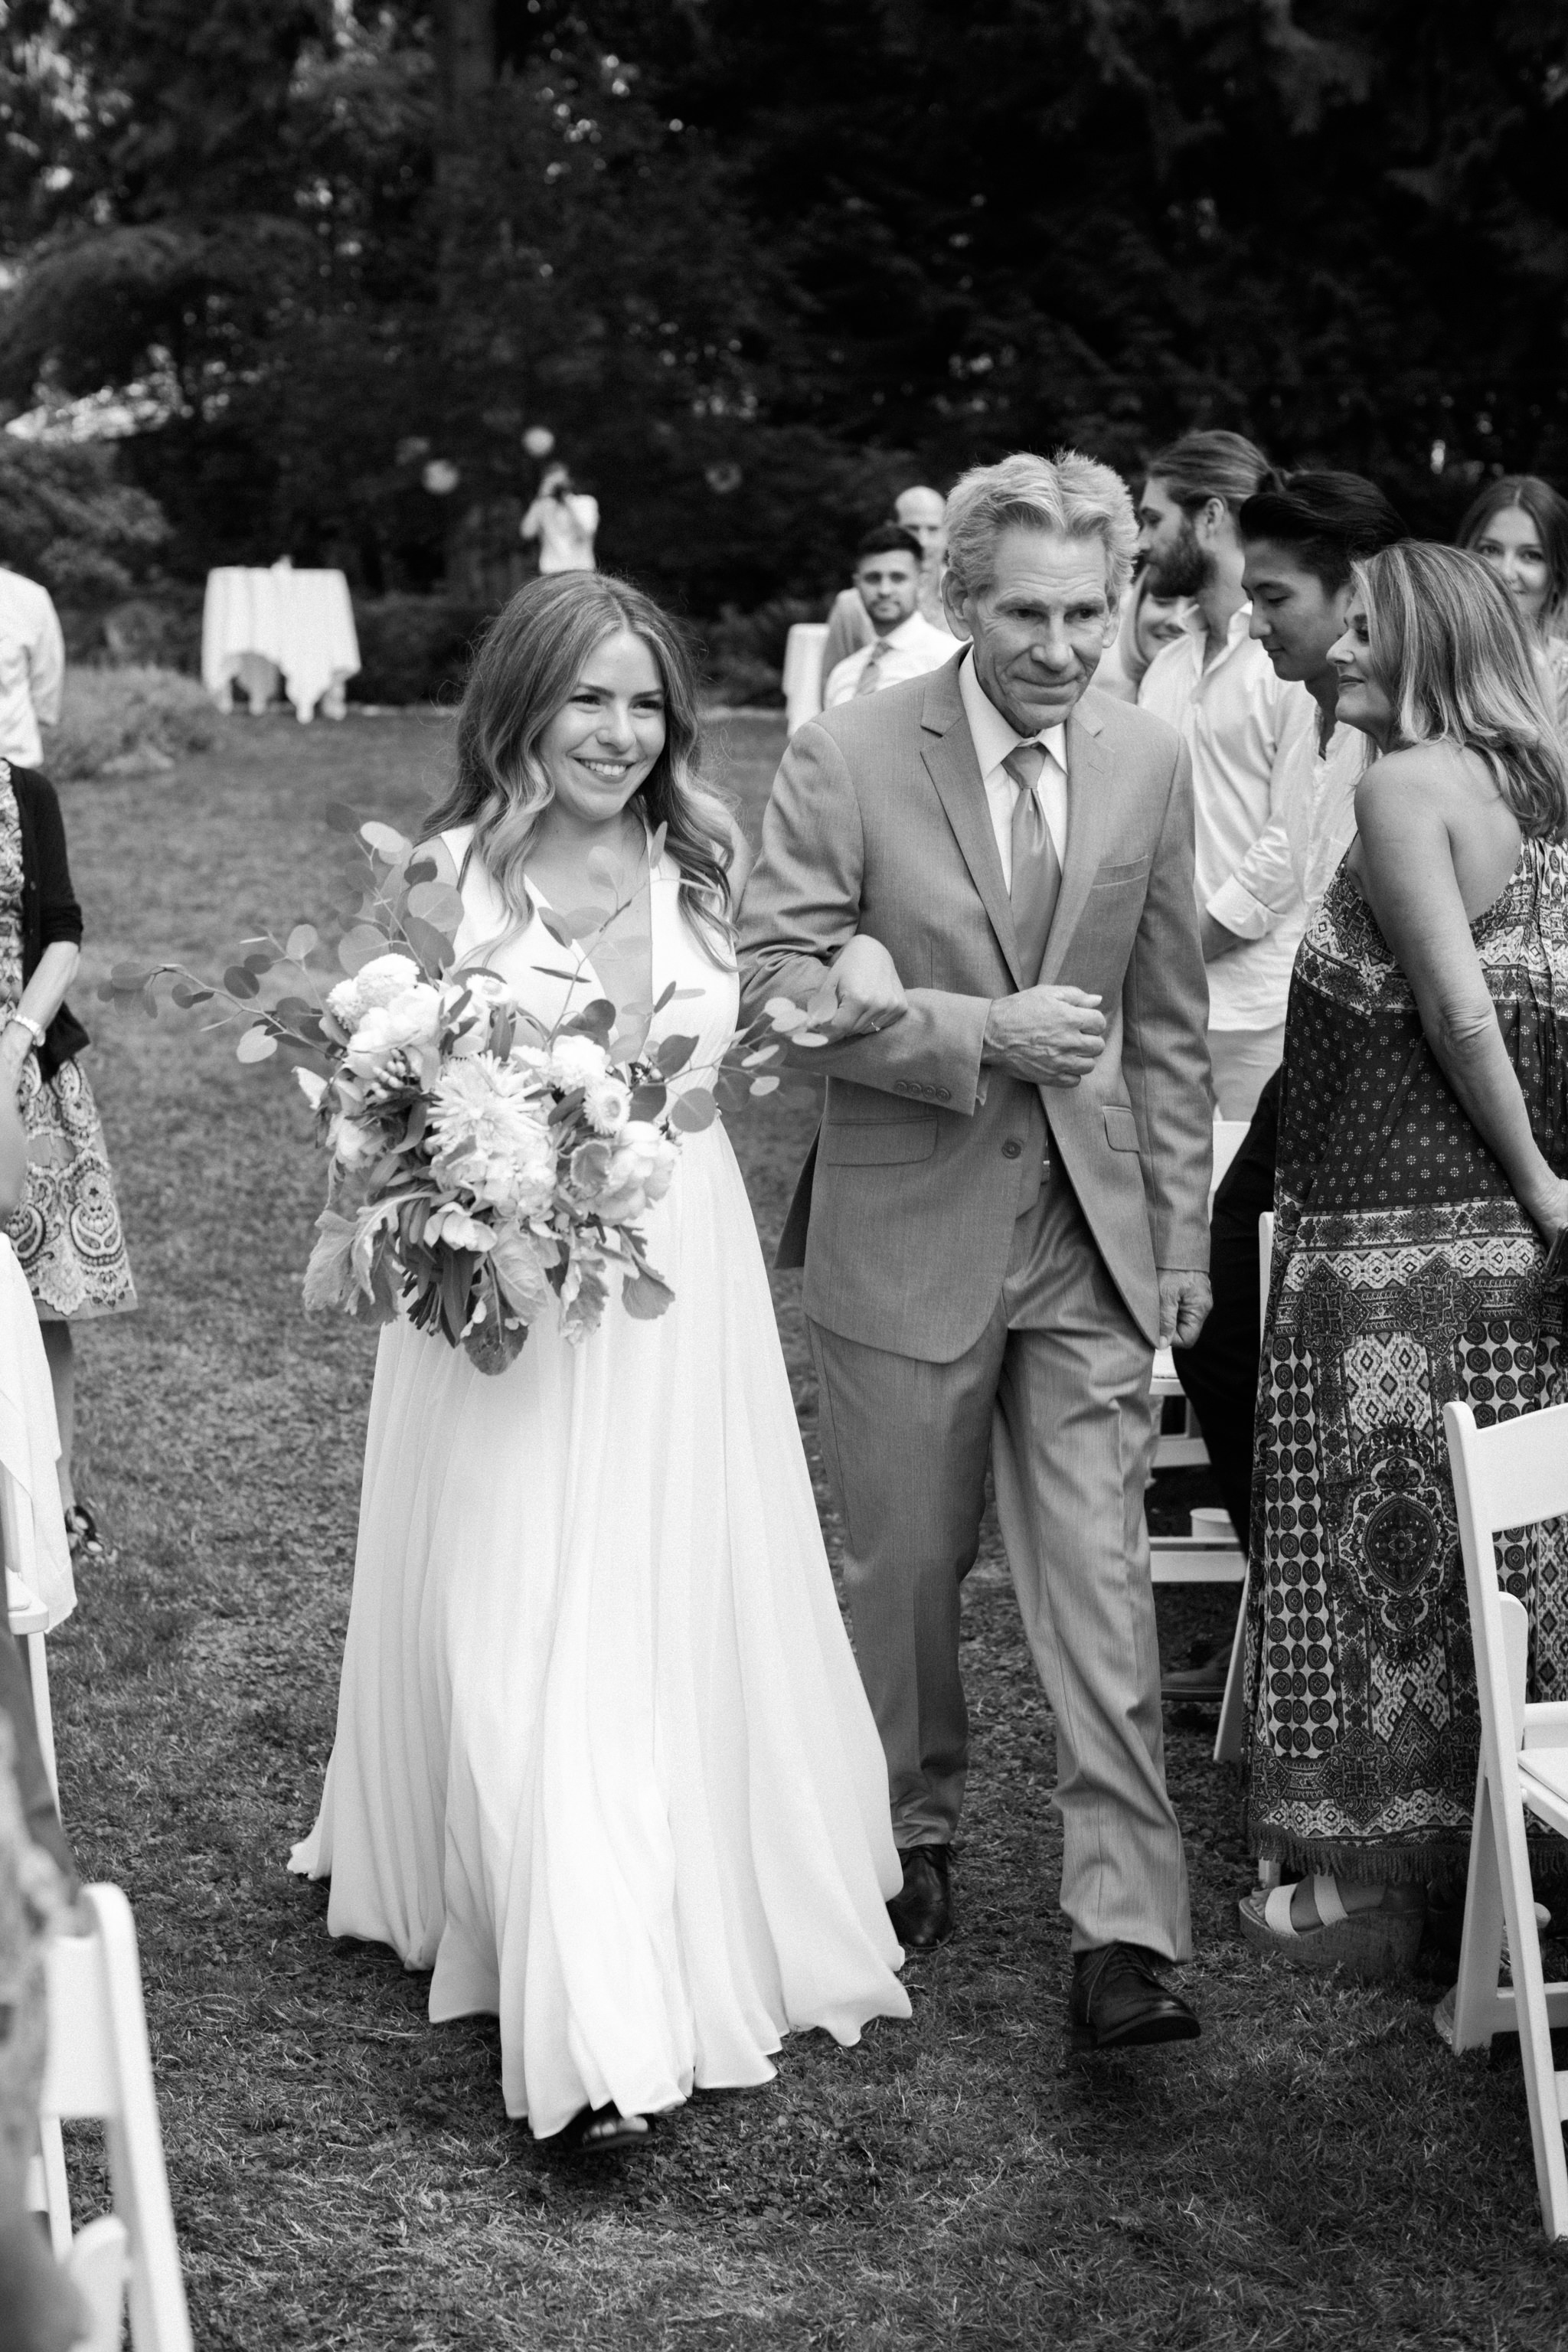 Backyard-Bainbridge-Island-Wedding-Alycia-Lovell-Photography-88.JPG